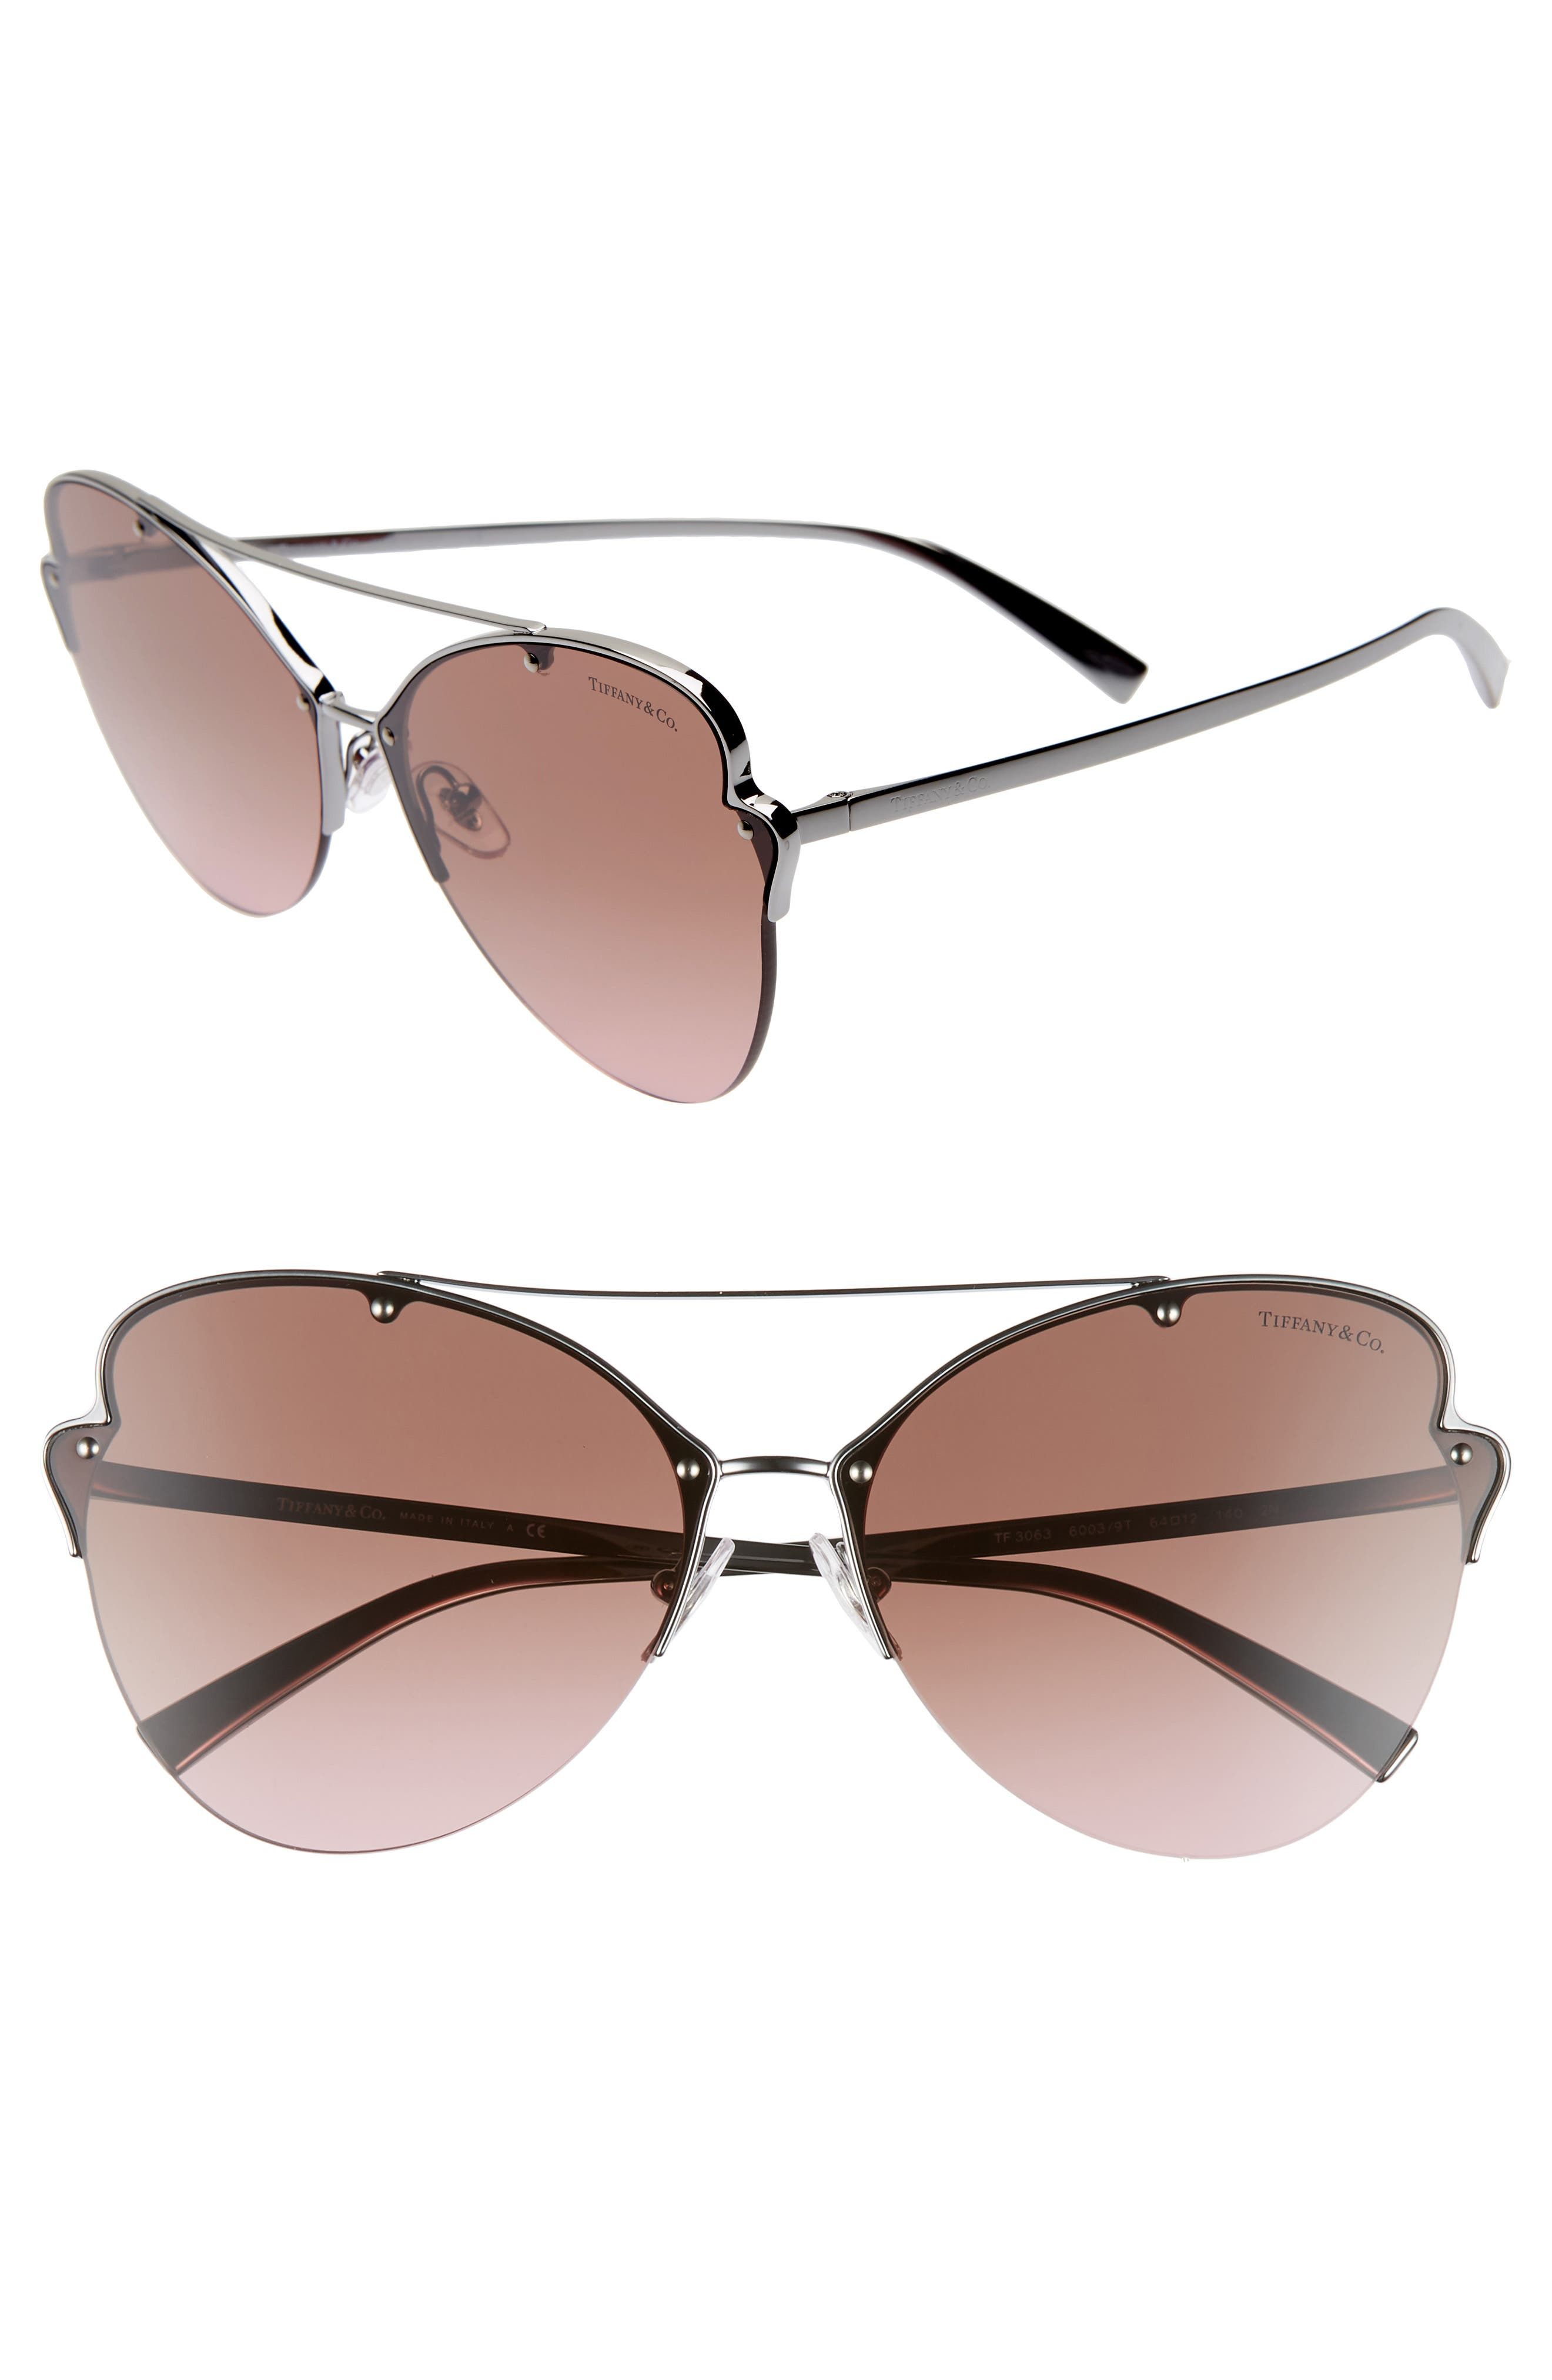 fa2ff8608a7 Women s Tiffany   Co. 64Mm Oversize Butterfly Sunglasses - Gunmetal Gradient